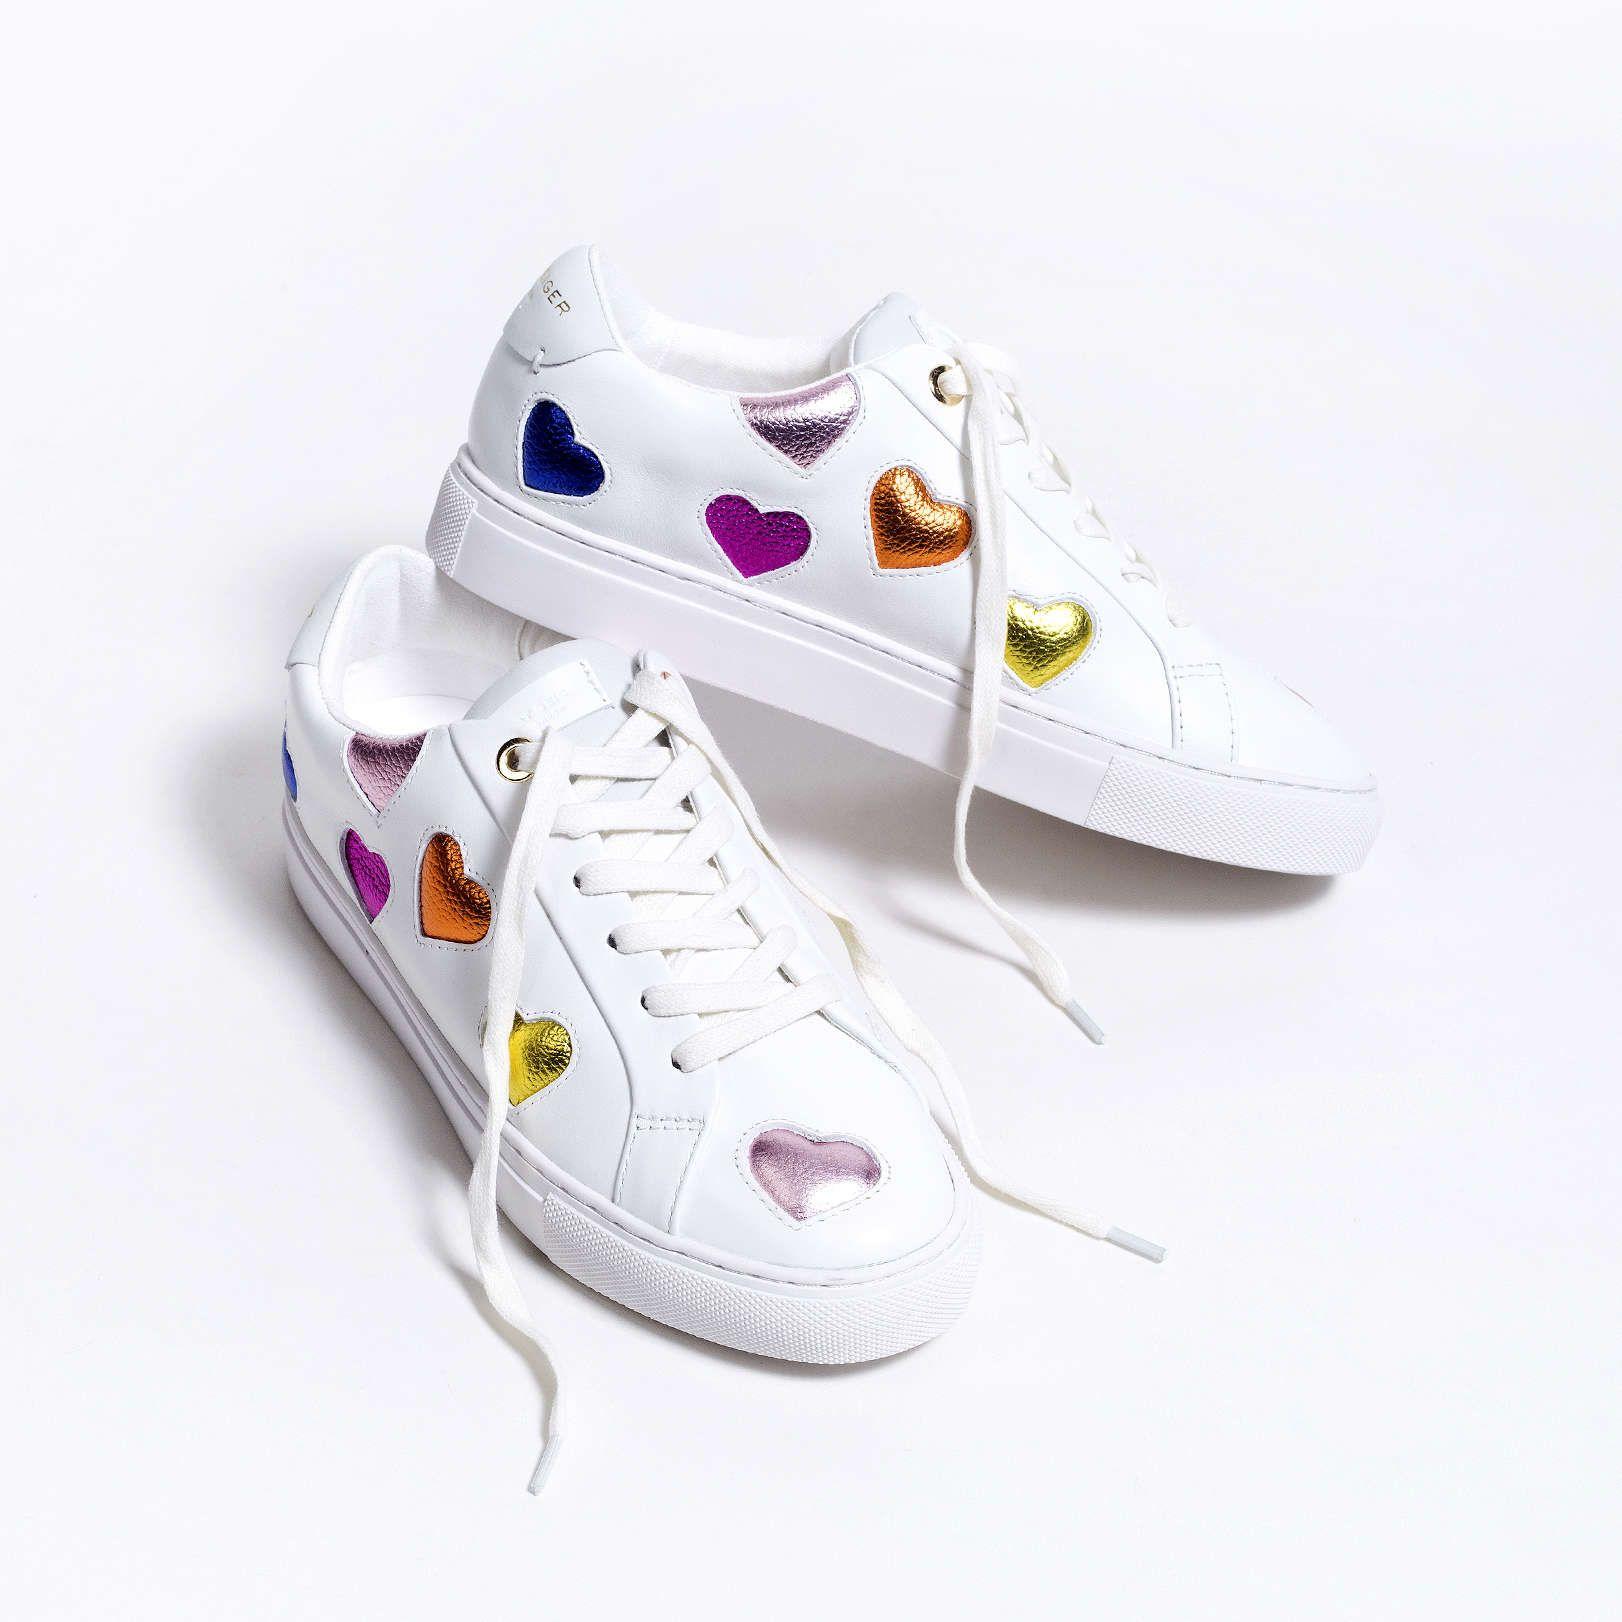 Kurt geiger shoes, Top sneakers women